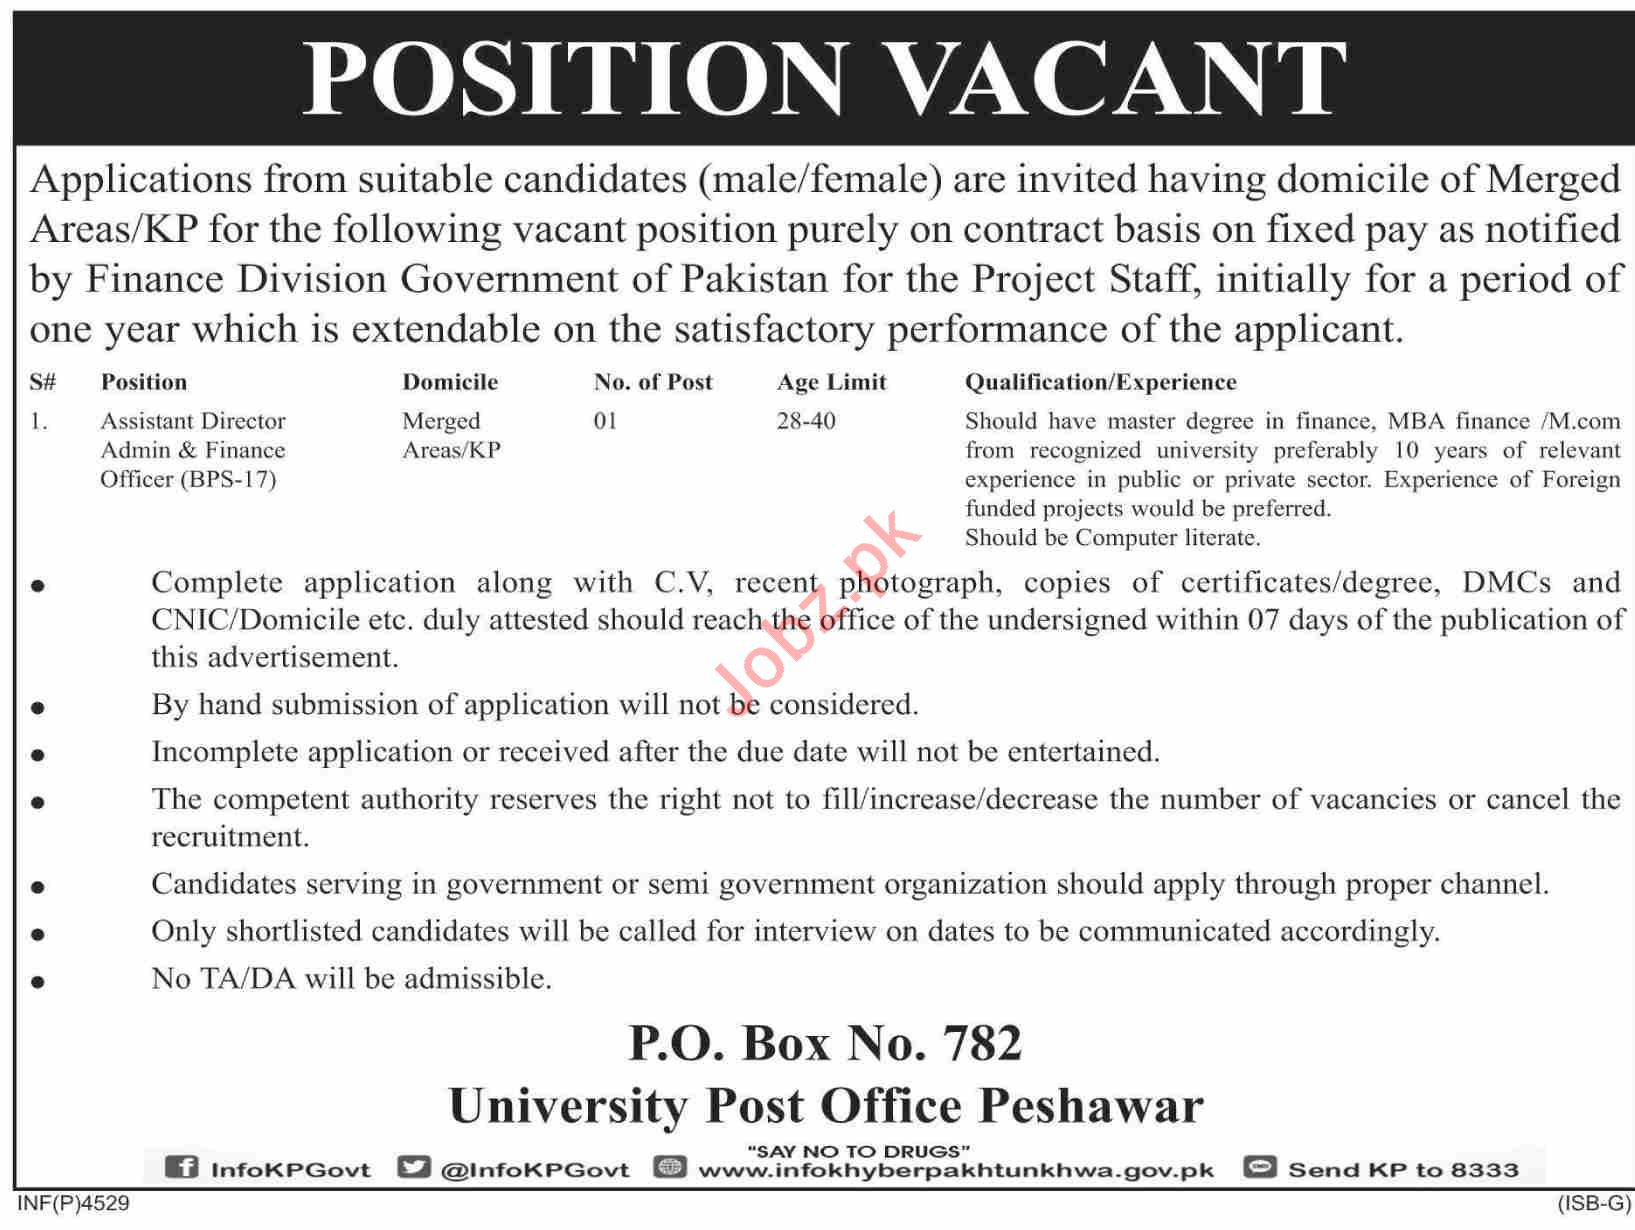 KPK Government Jobs 2019 P O Box 782 University Post Office